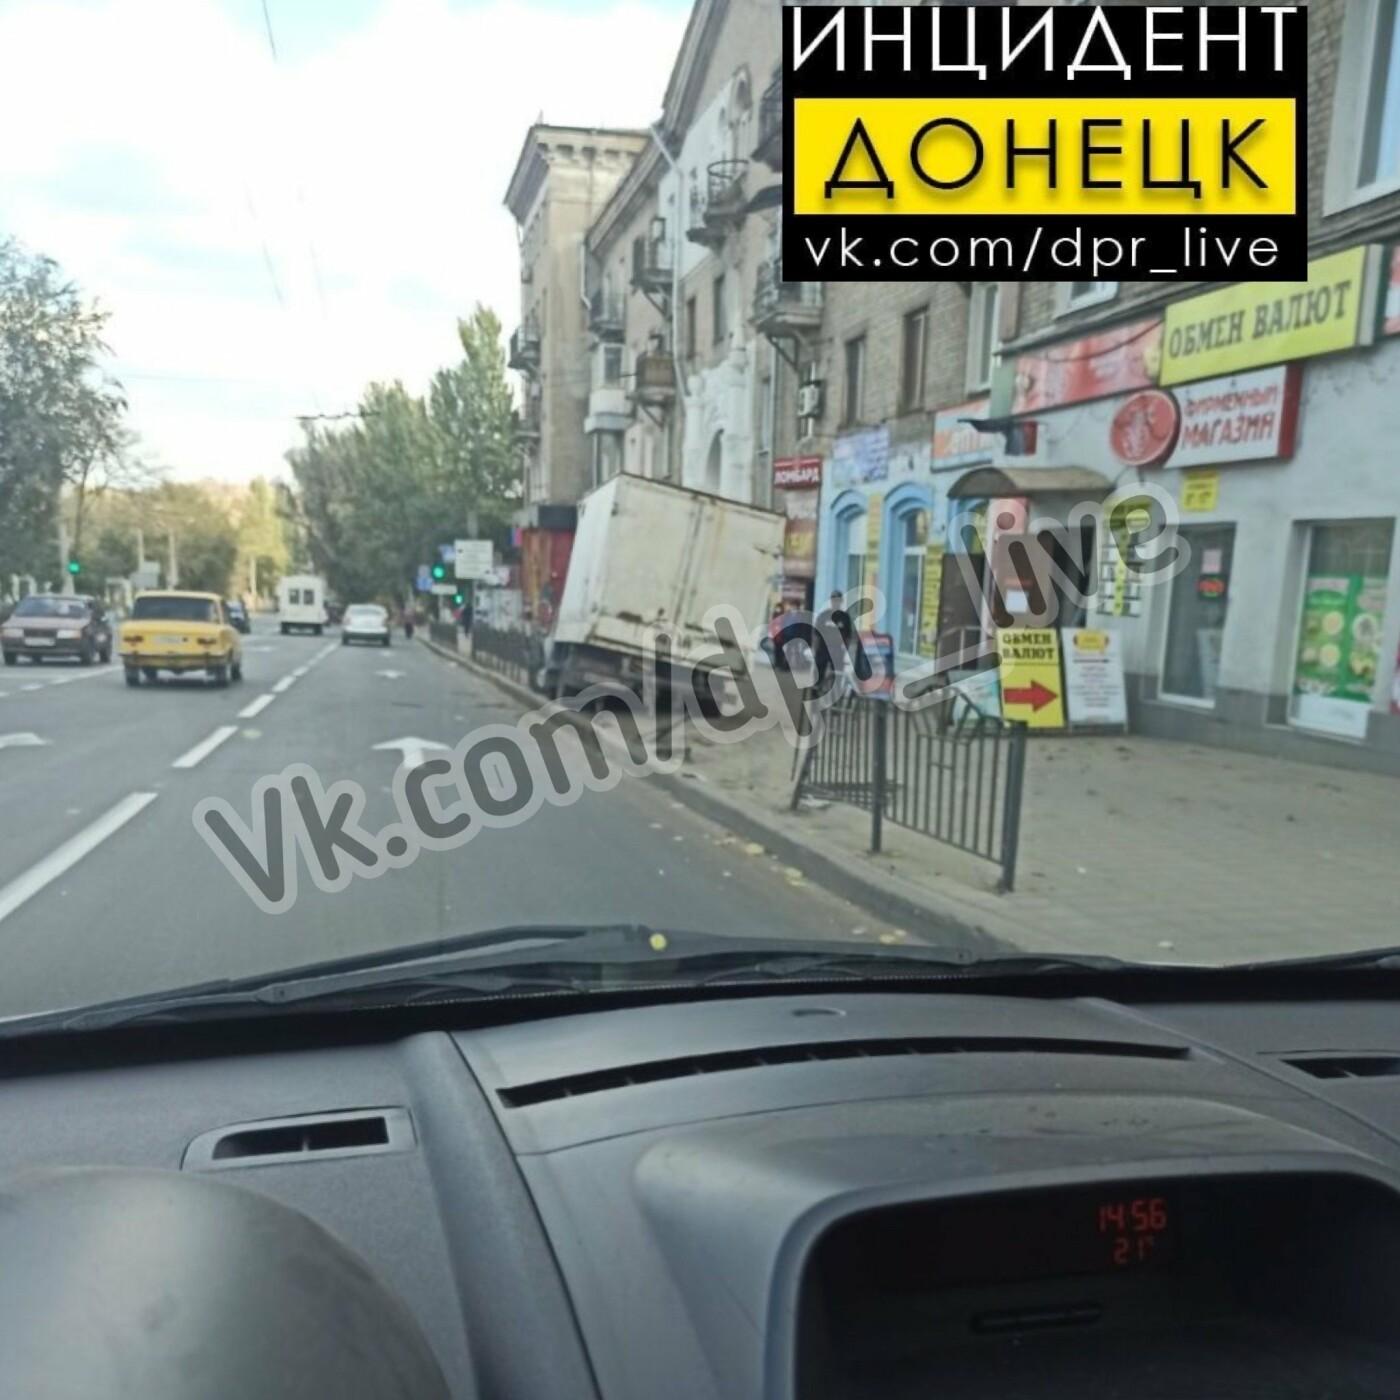 xosscjlzm4 5f8acde260522 - В Донецке у «Газели» отказали тормоза и она «притормозила» об ограду тротуара, - ФОТО